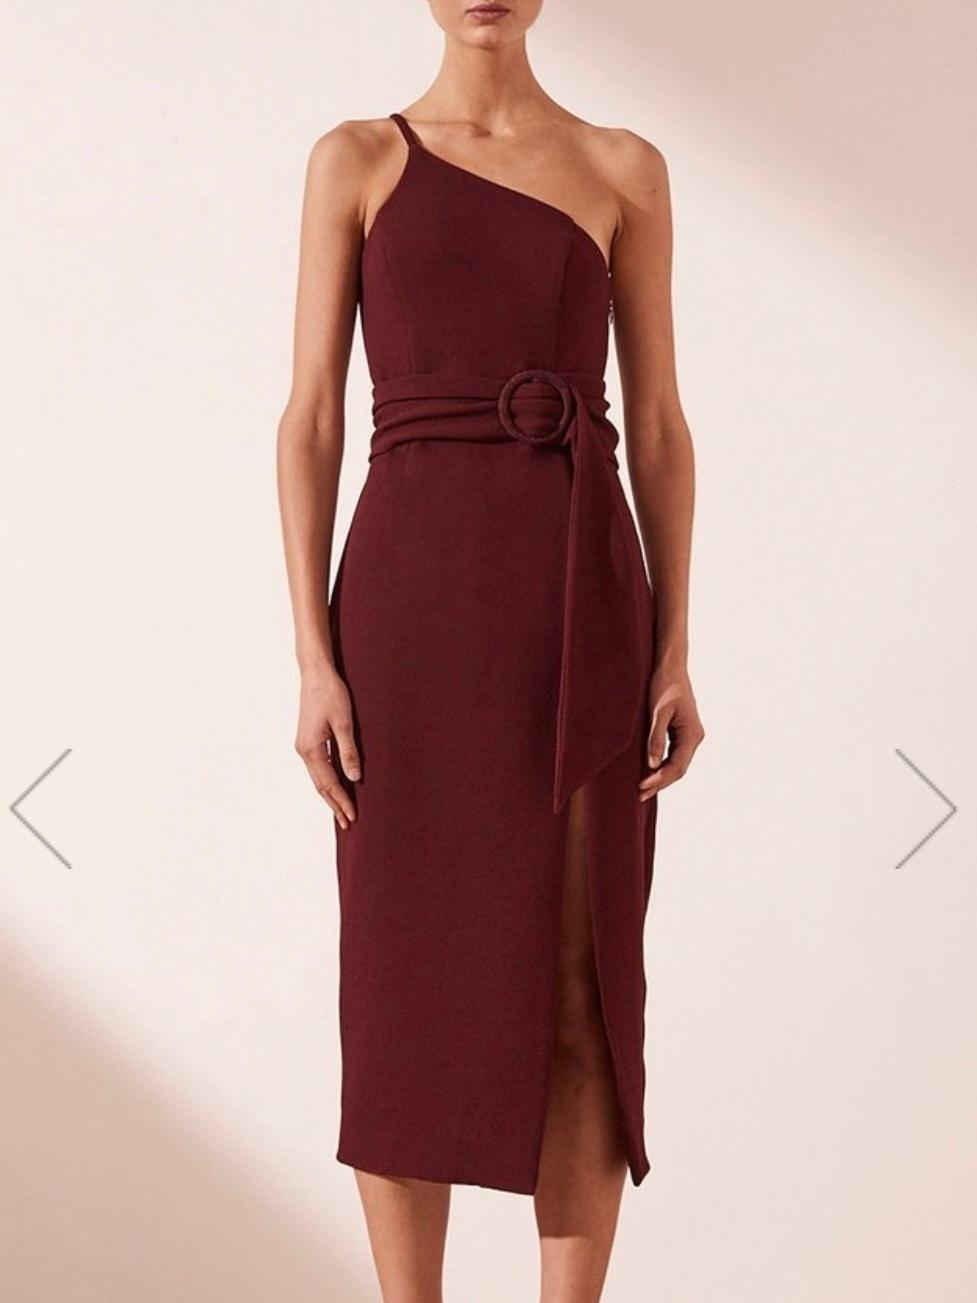 Shona Joy Andrea One Shoulder Fitted Midi Dress Burgundy 6